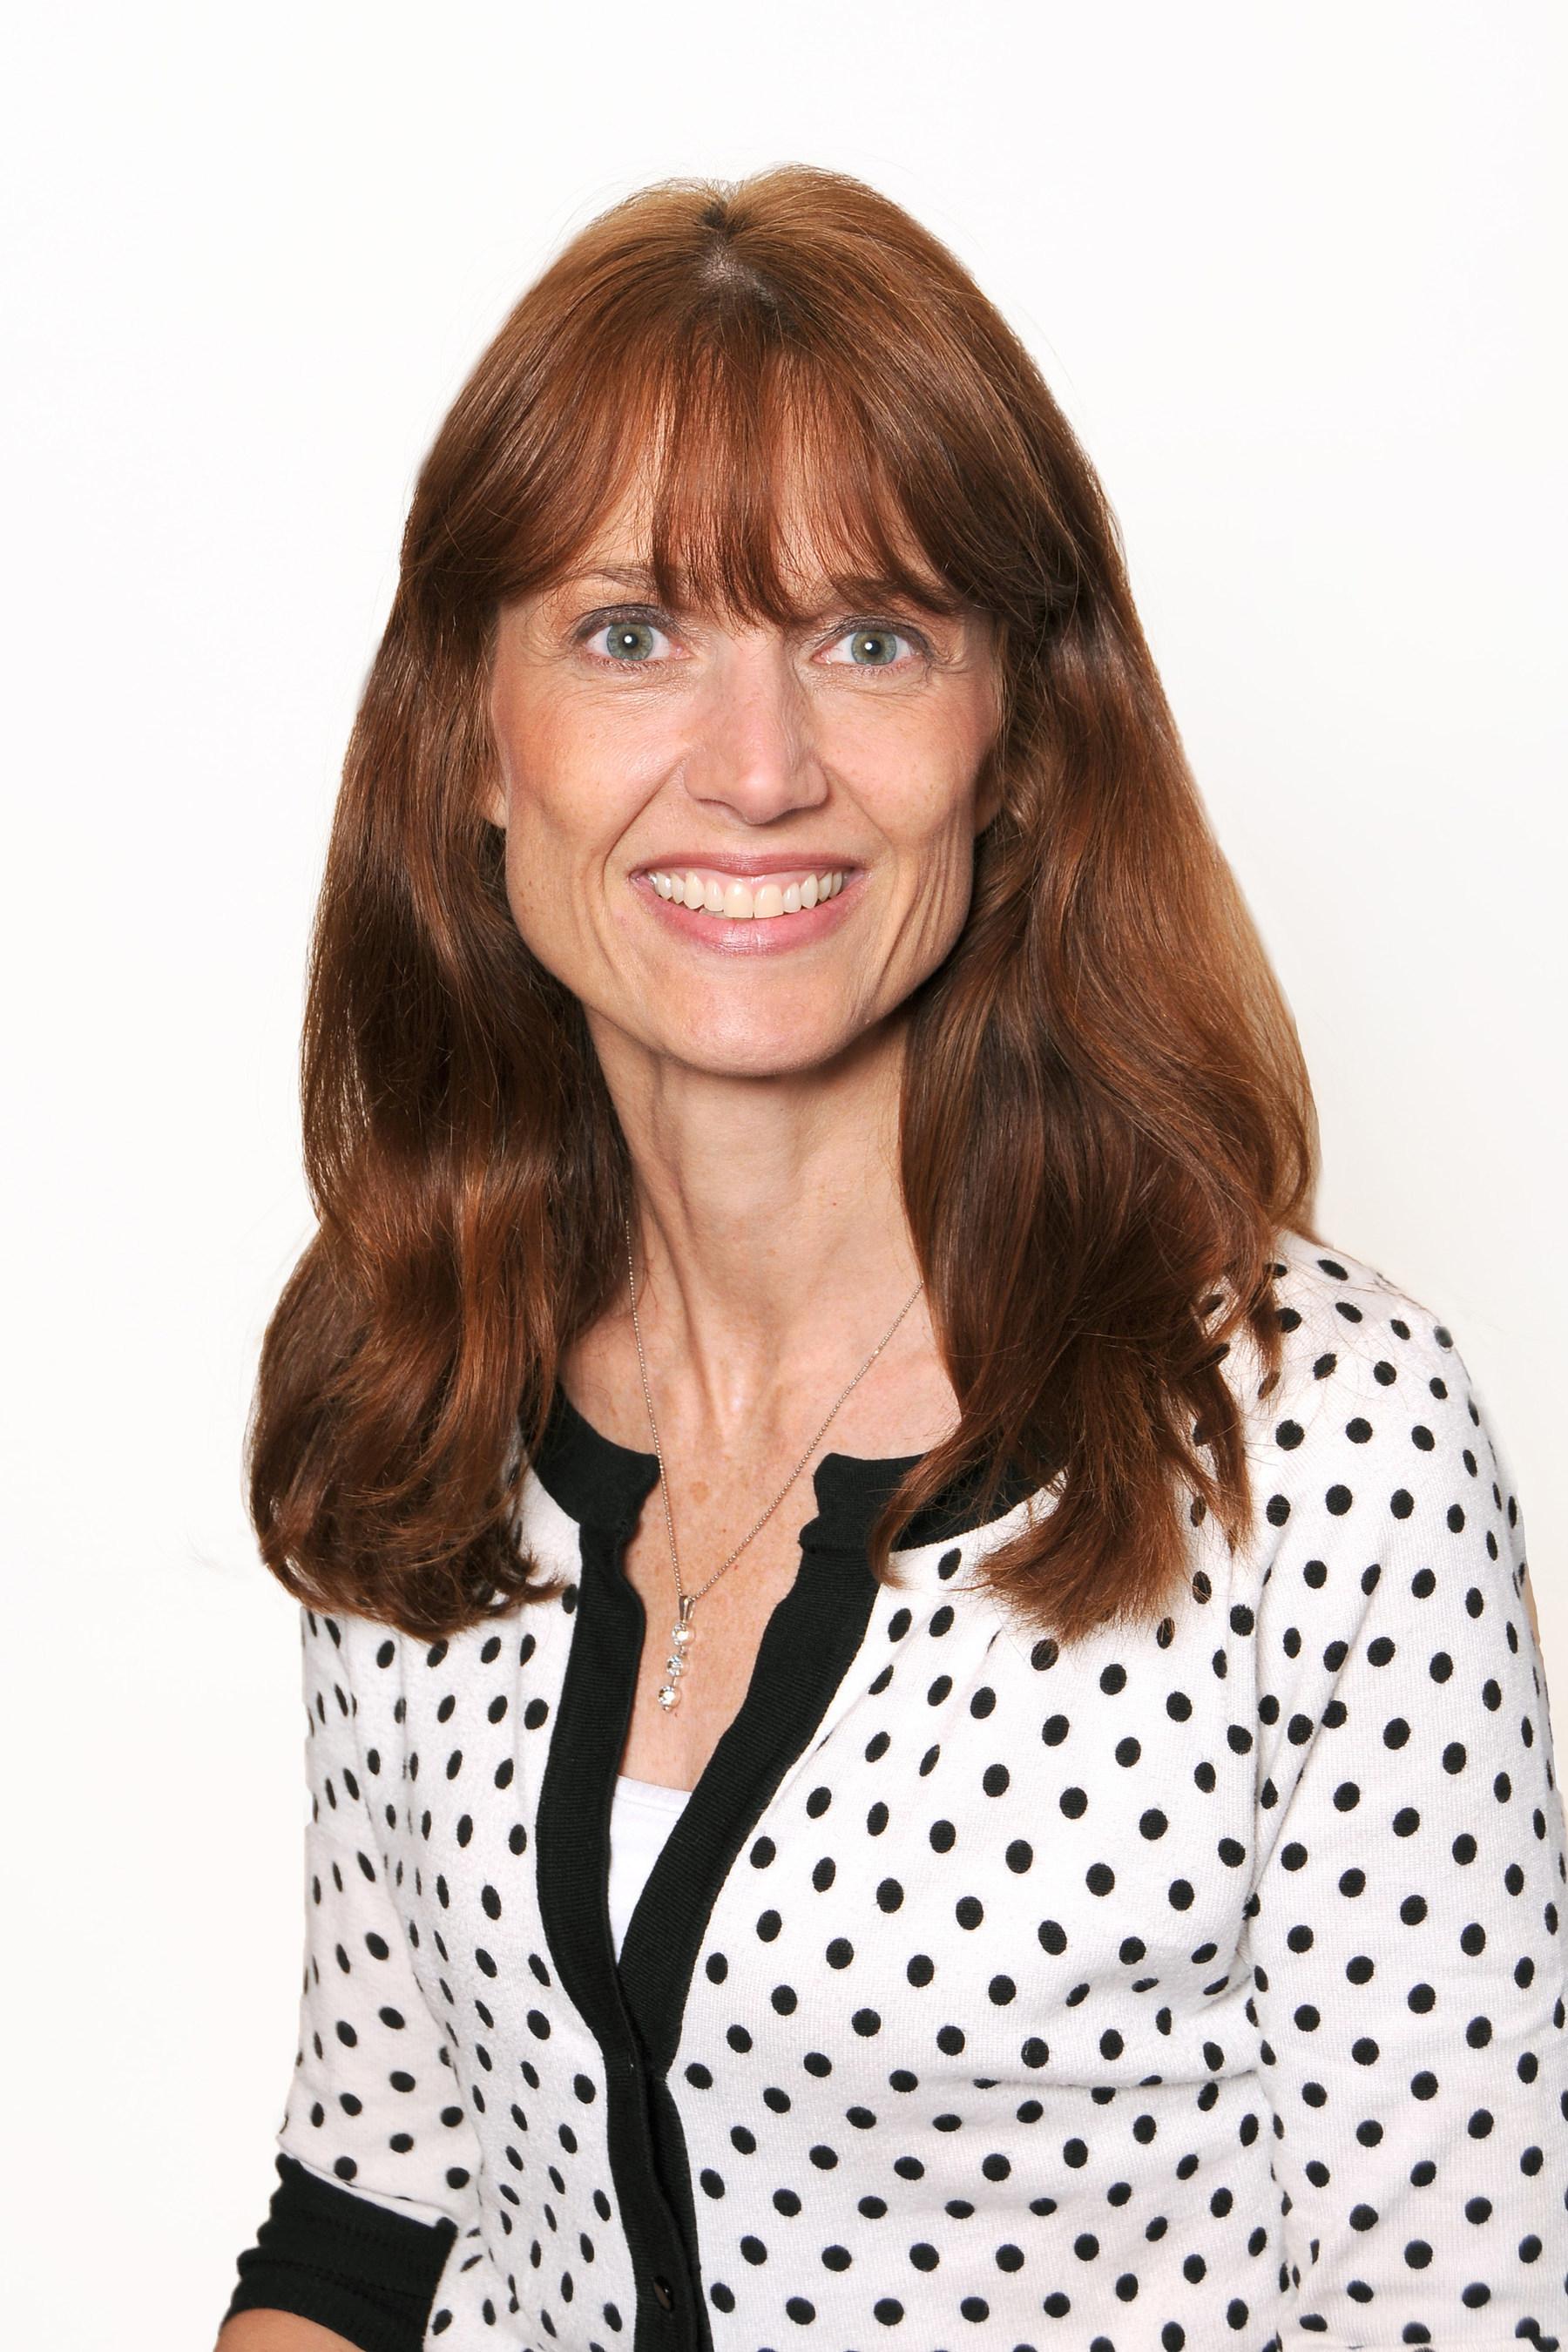 Harriet Porter, Vice President, Convention Sales, Anaheim/Orange County Visitor & Convention Bureau